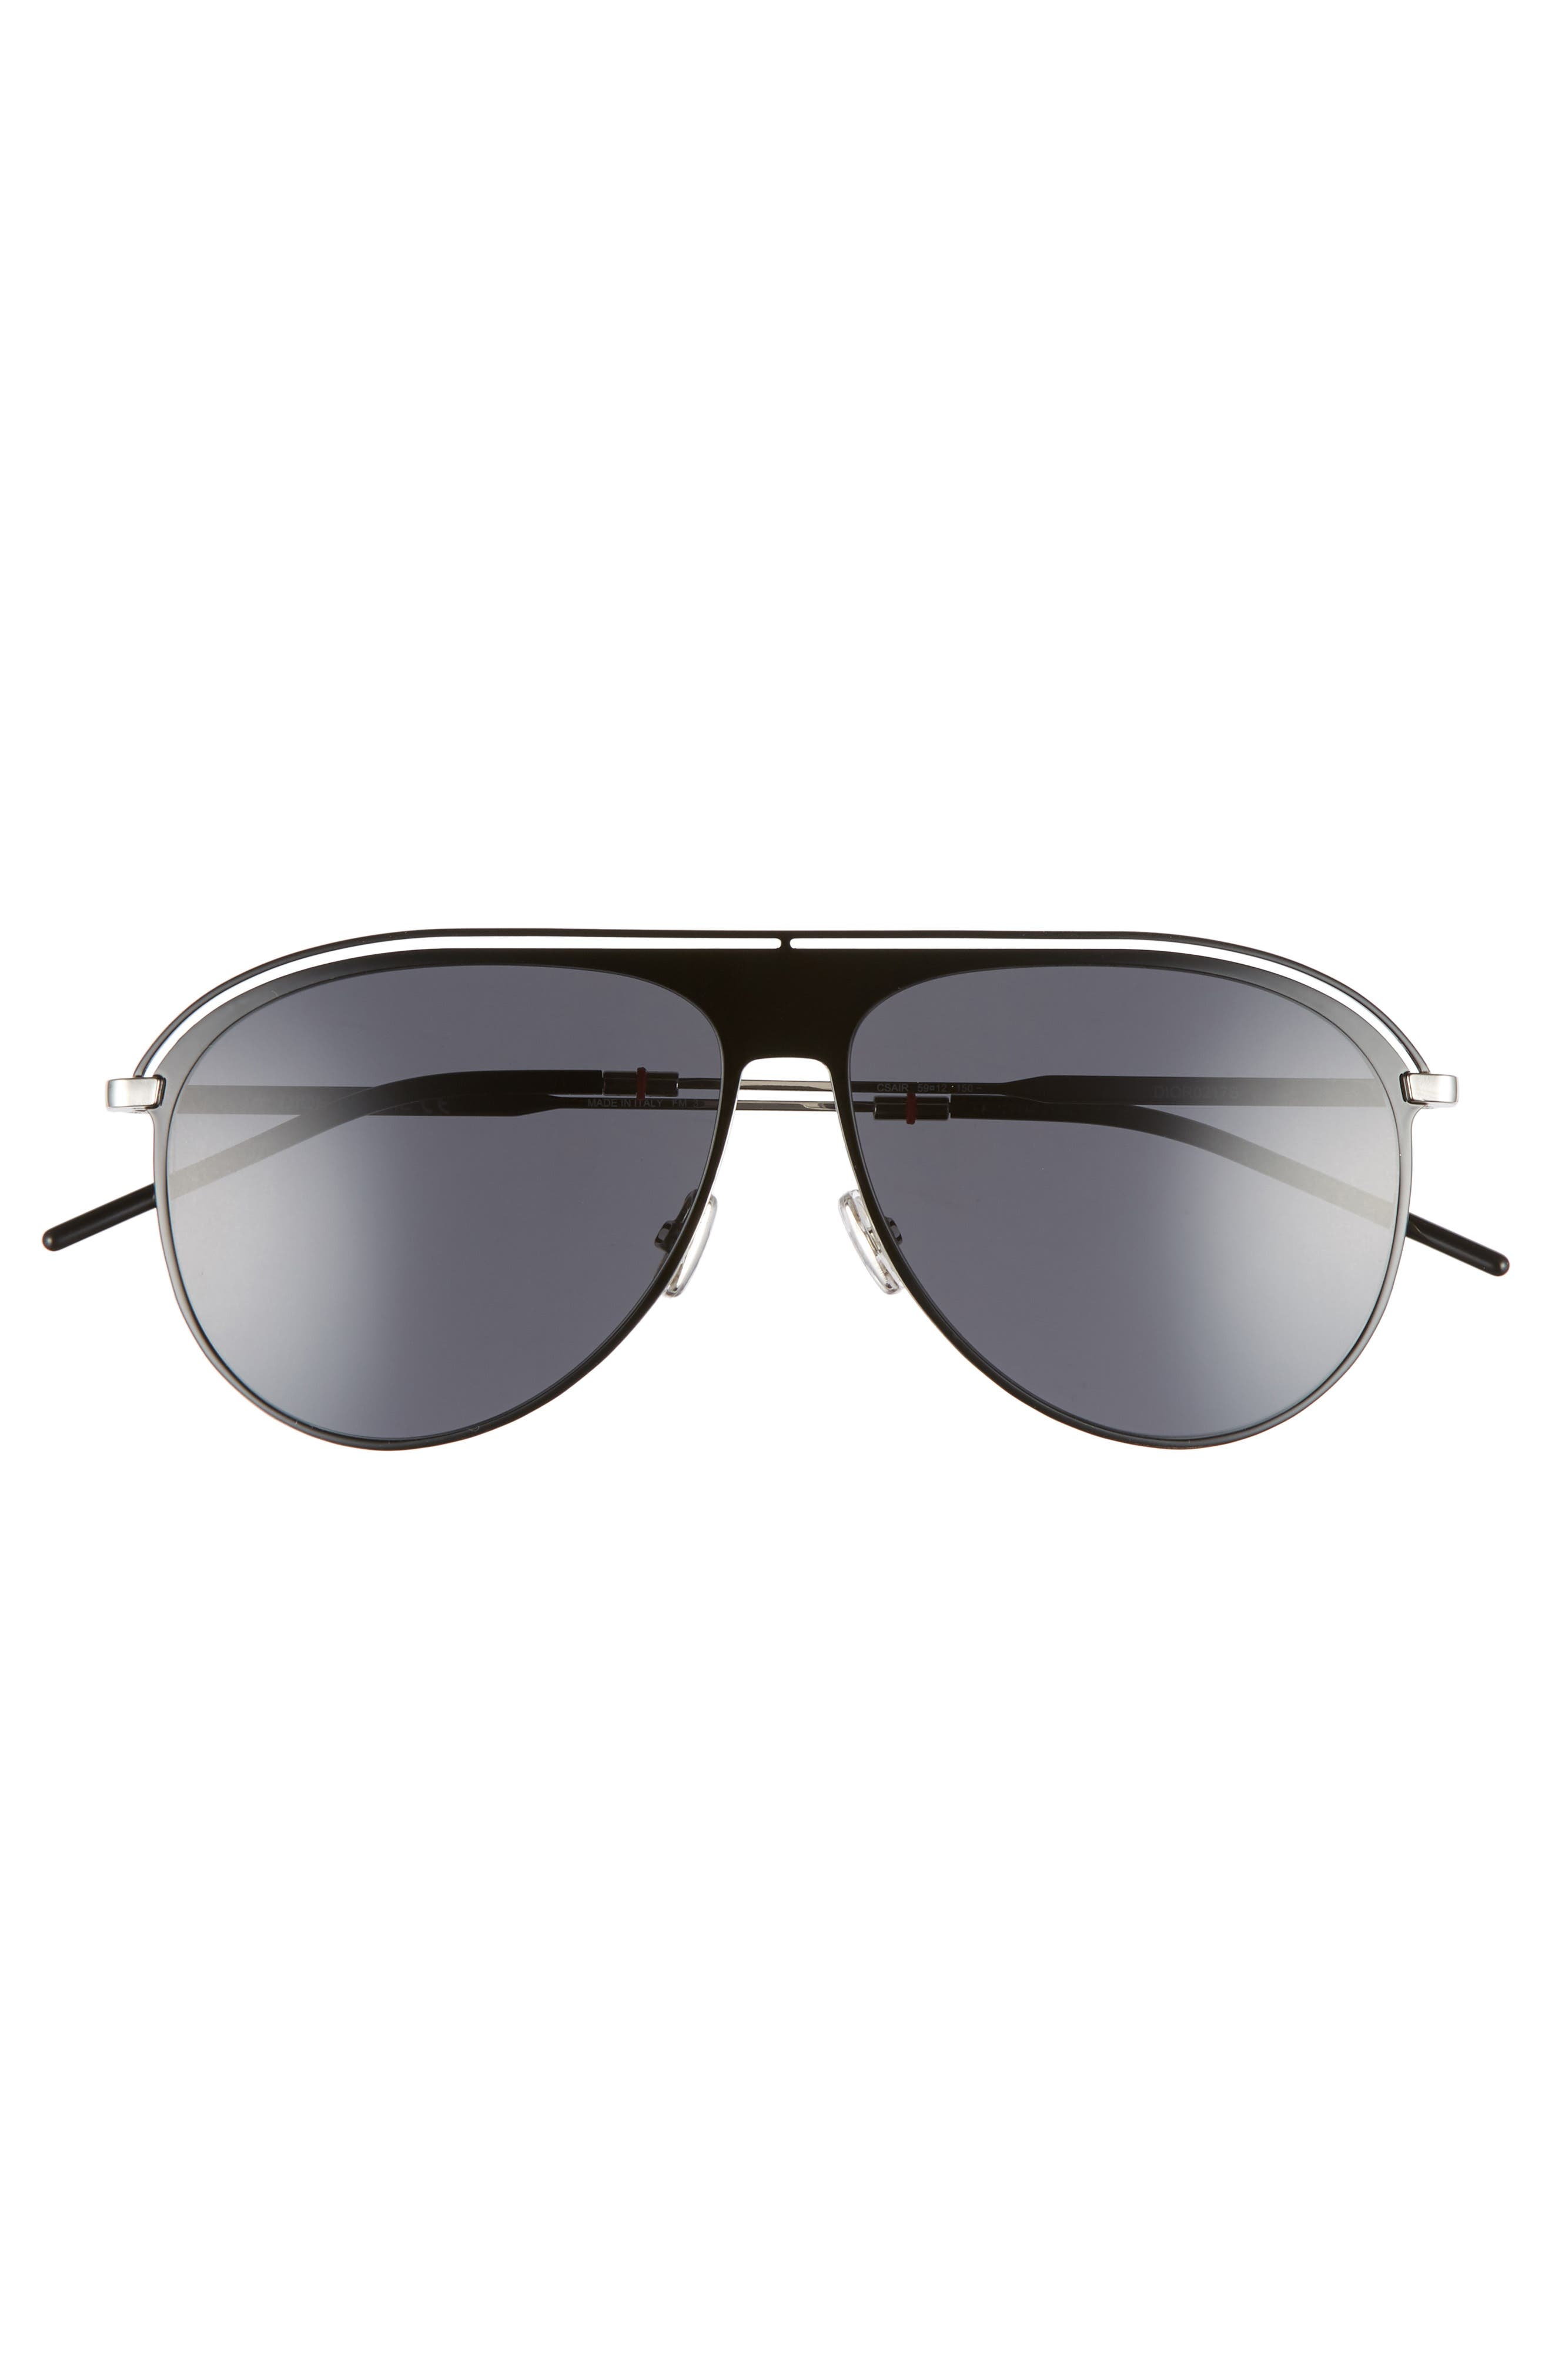 59mm Polarized Aviator Sunglasses,                             Alternate thumbnail 2, color,                             BLACK PALLADIUM